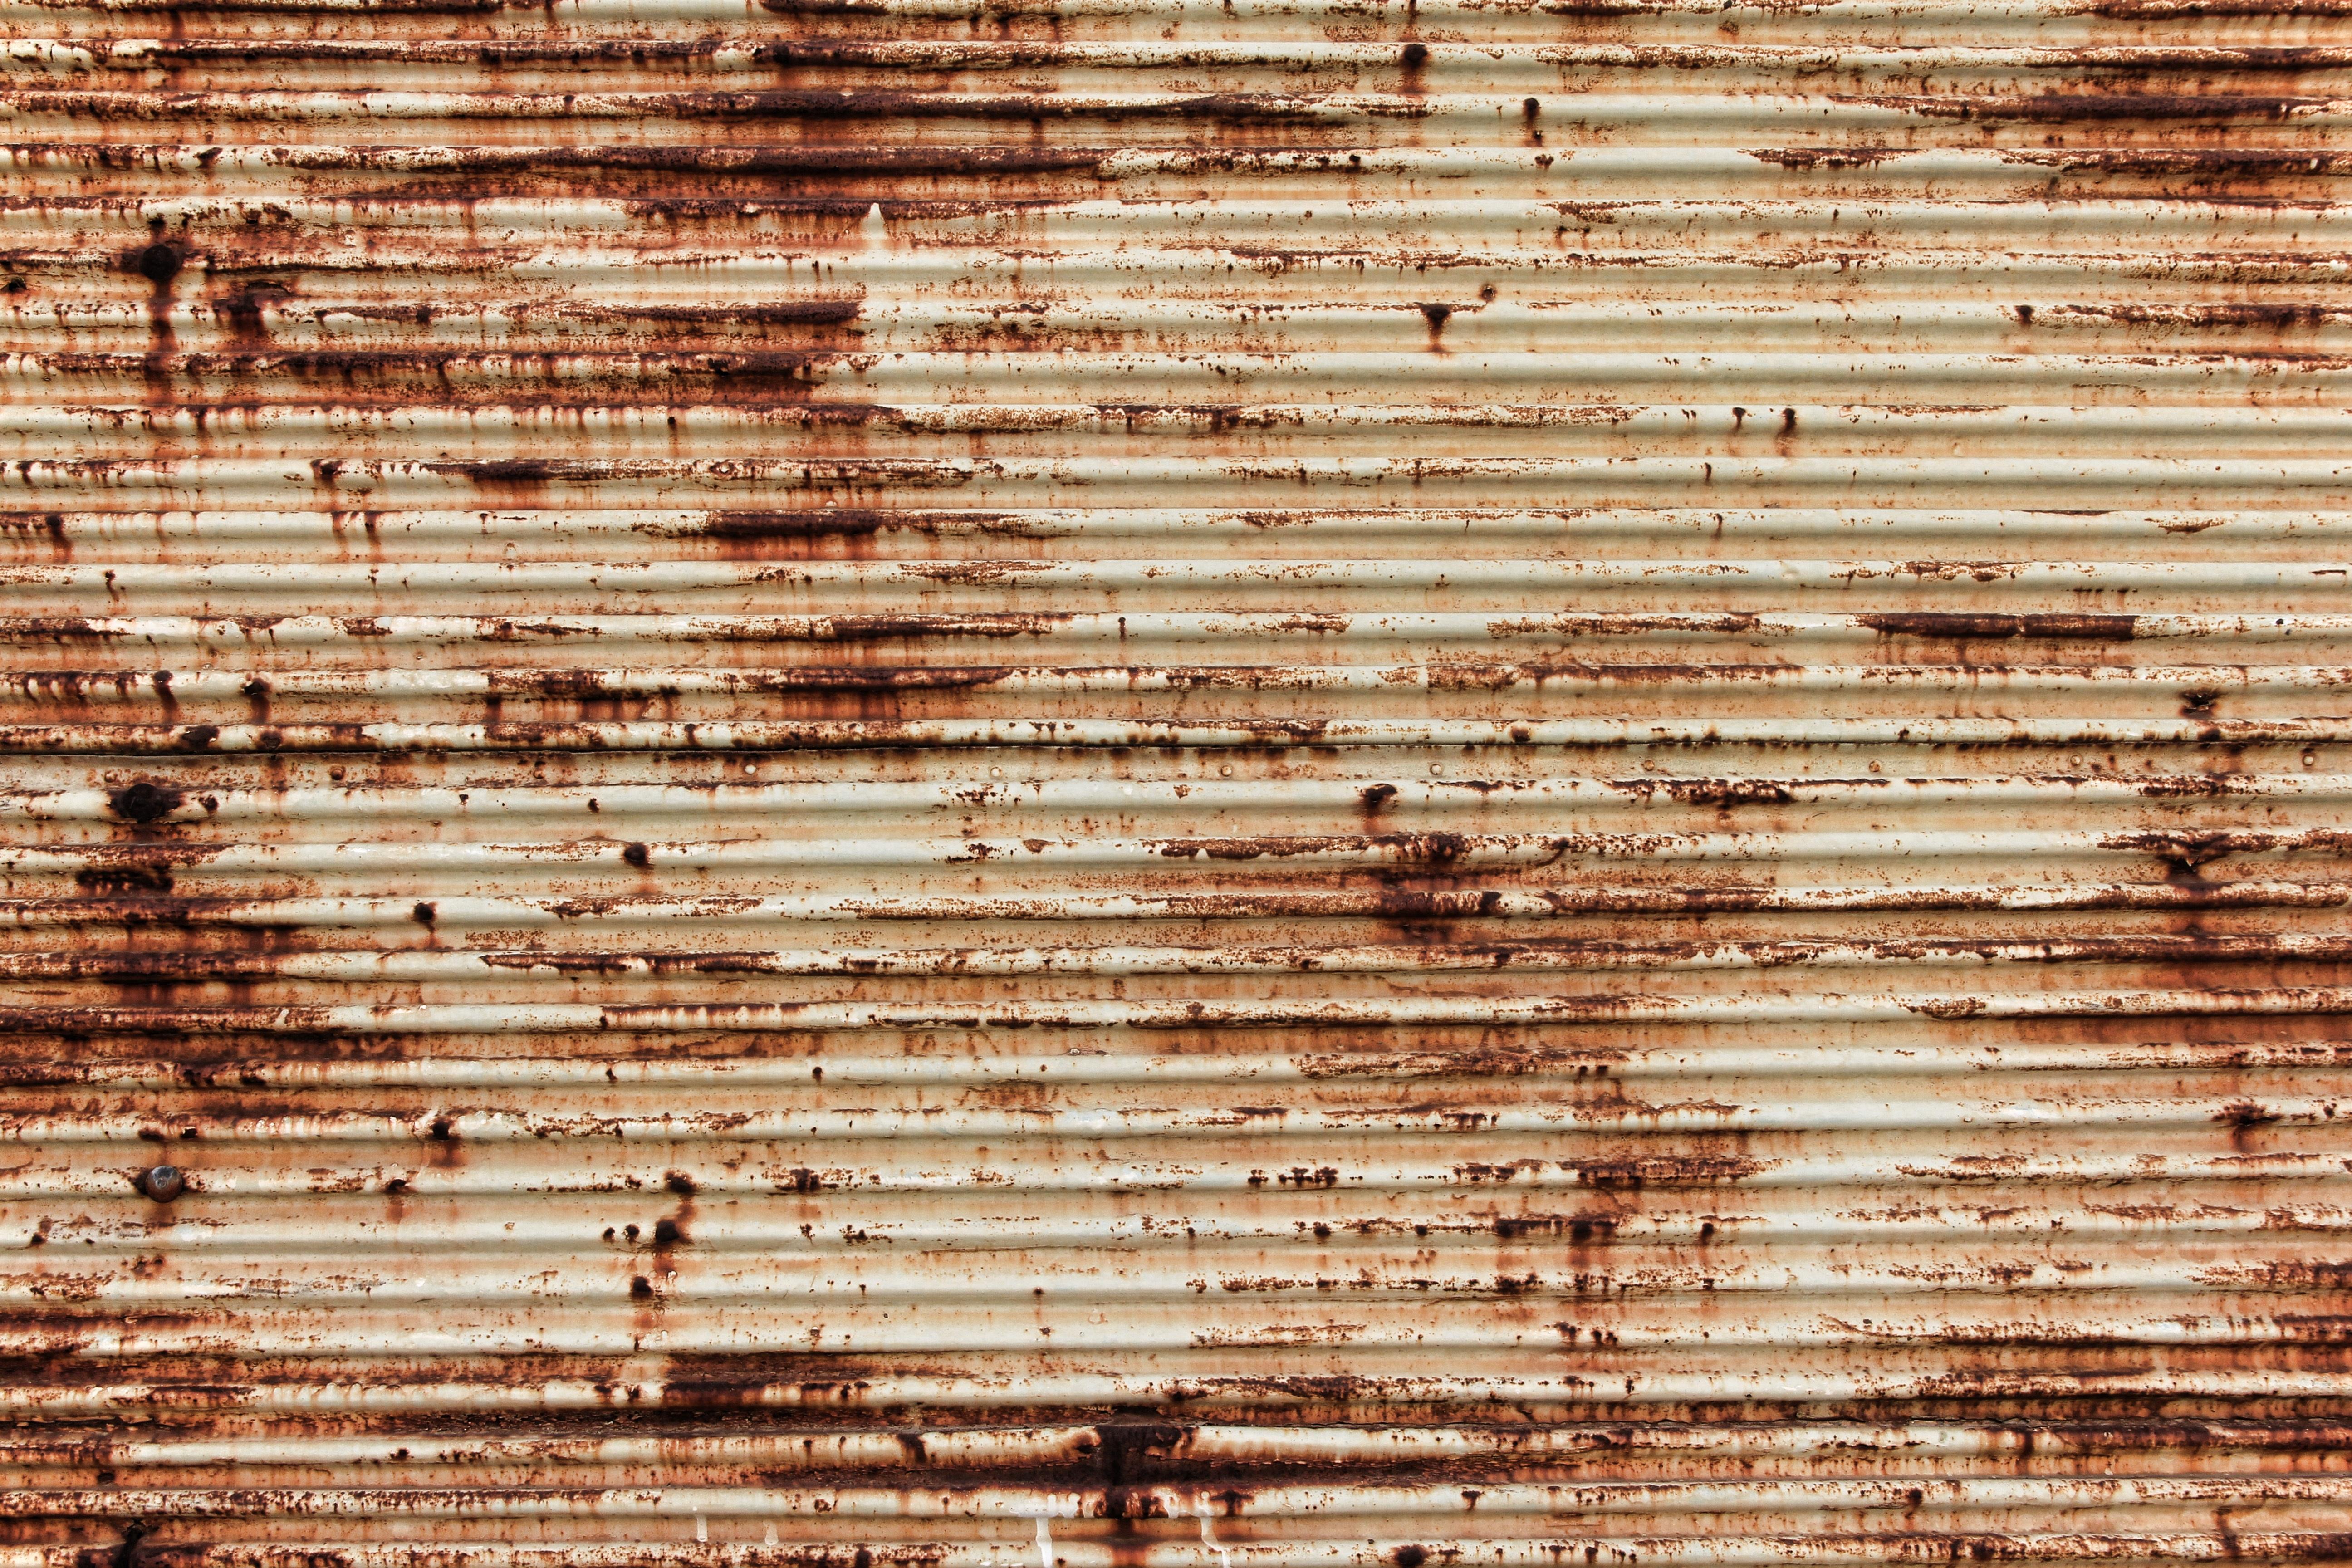 Fotos gratis : estructura, textura, tablón, piso, pared, patrón ...